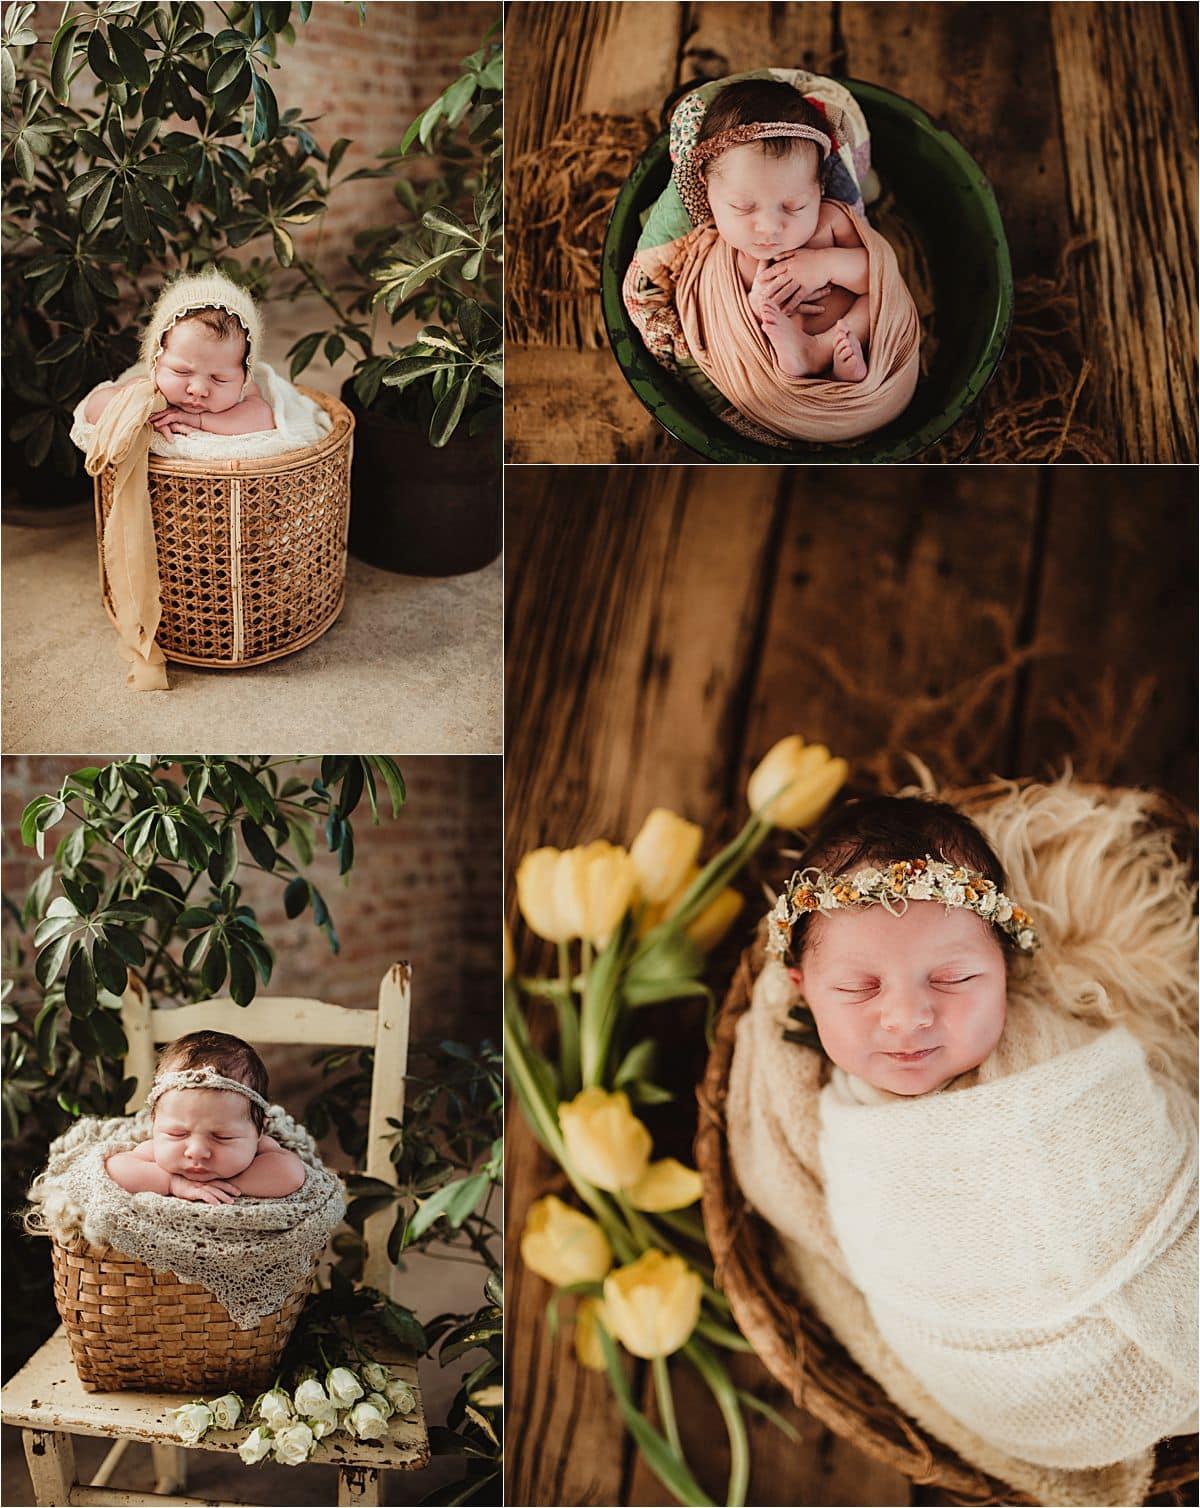 Newborn Girl with Plants